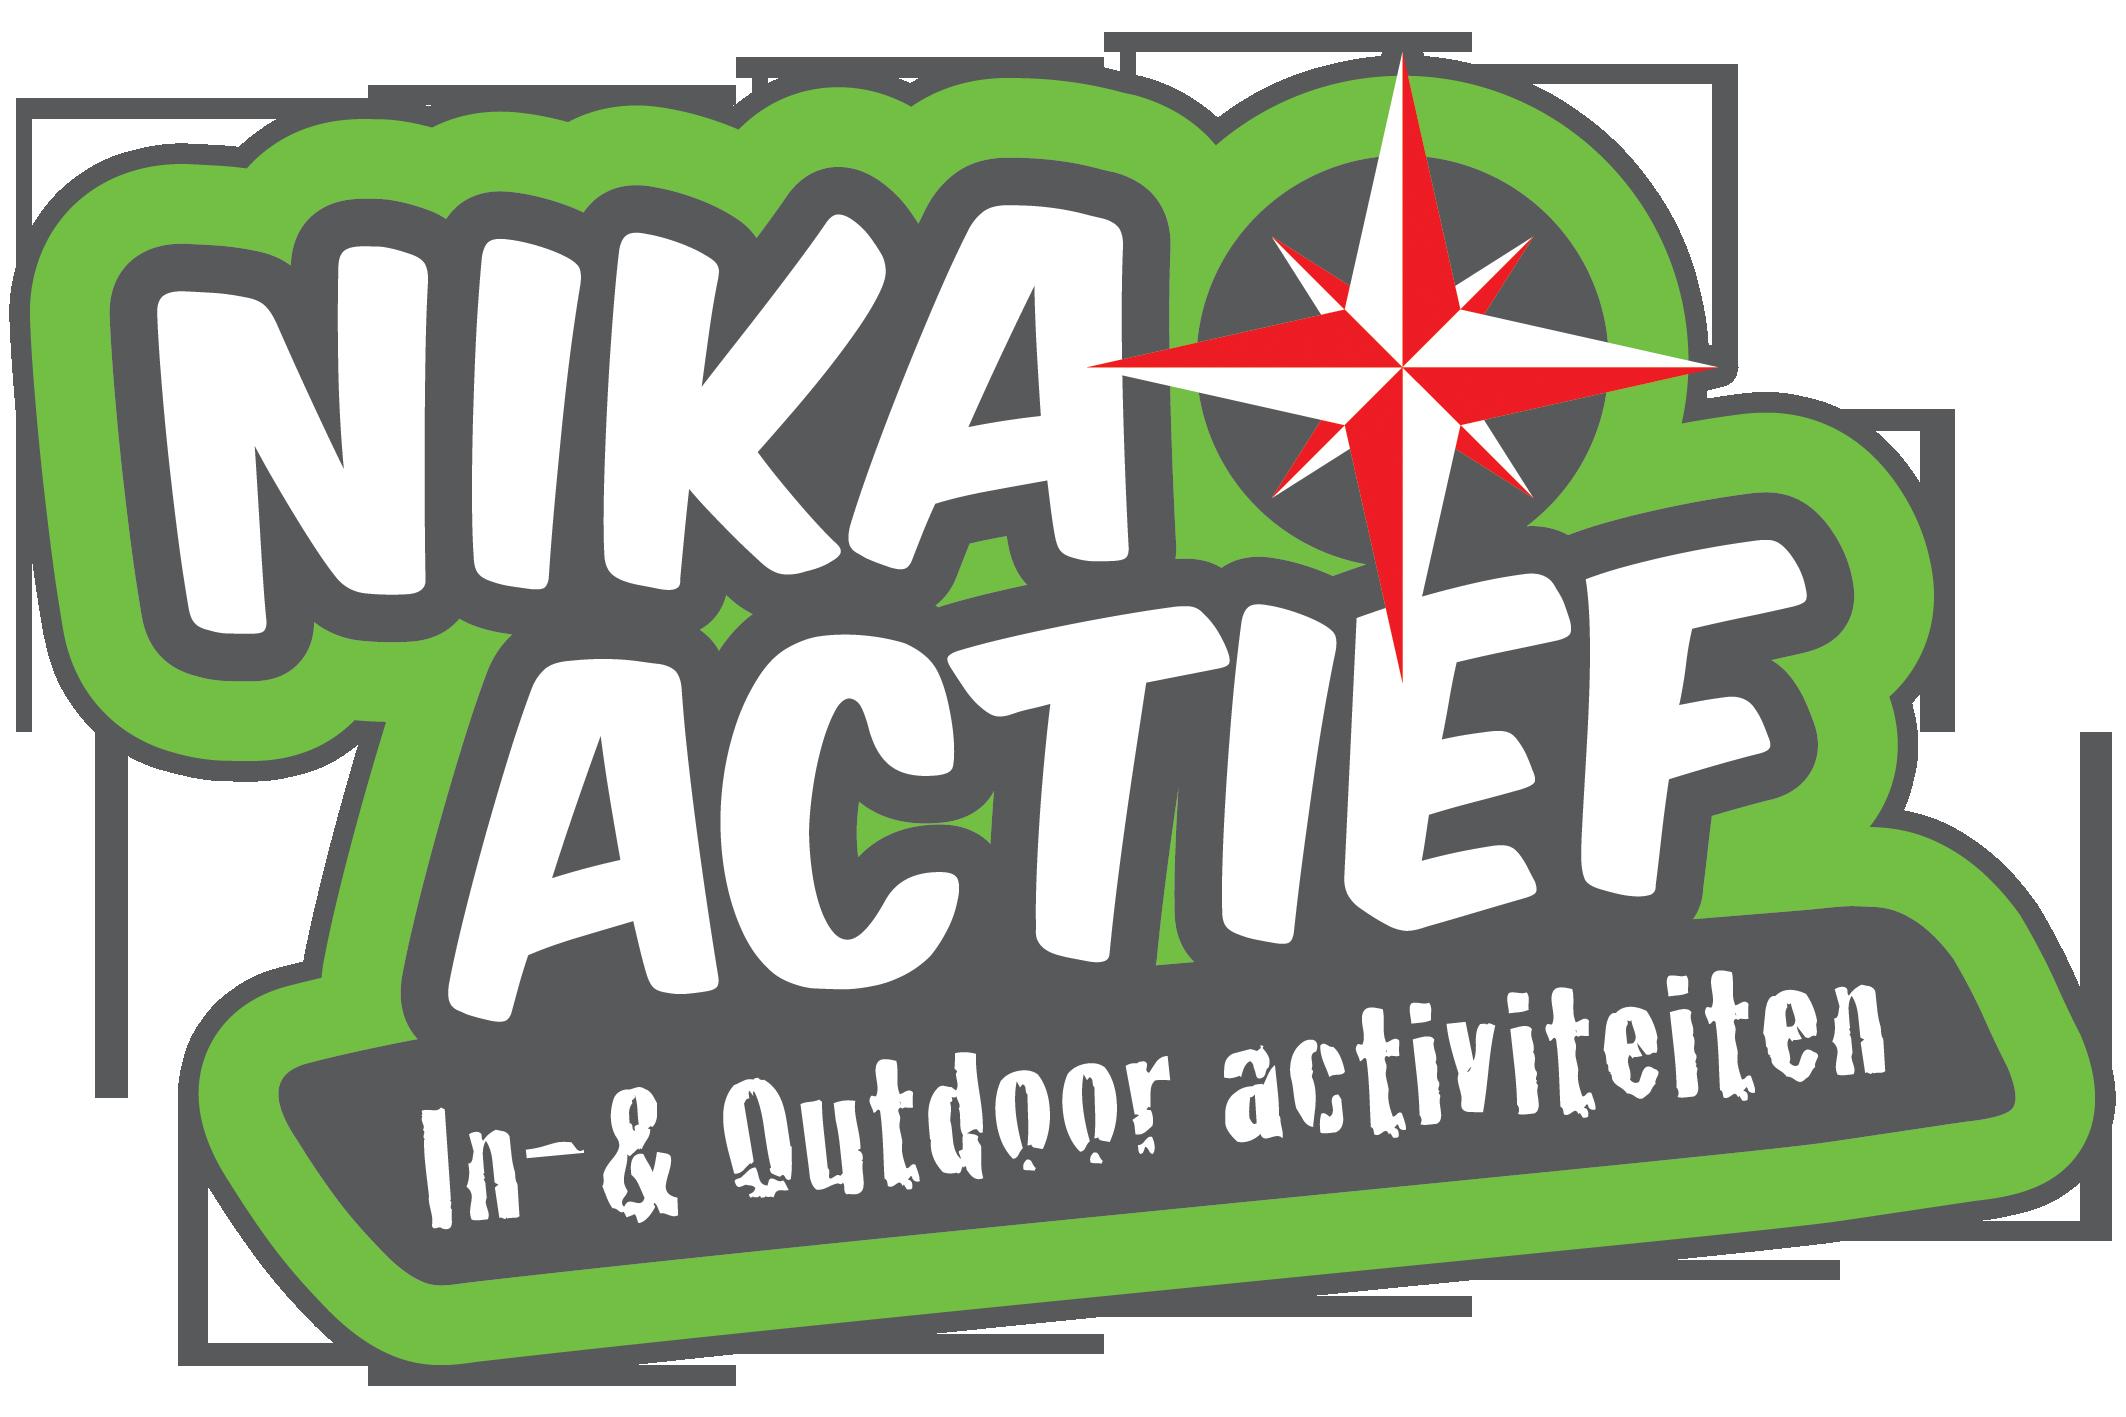 Nika Actief